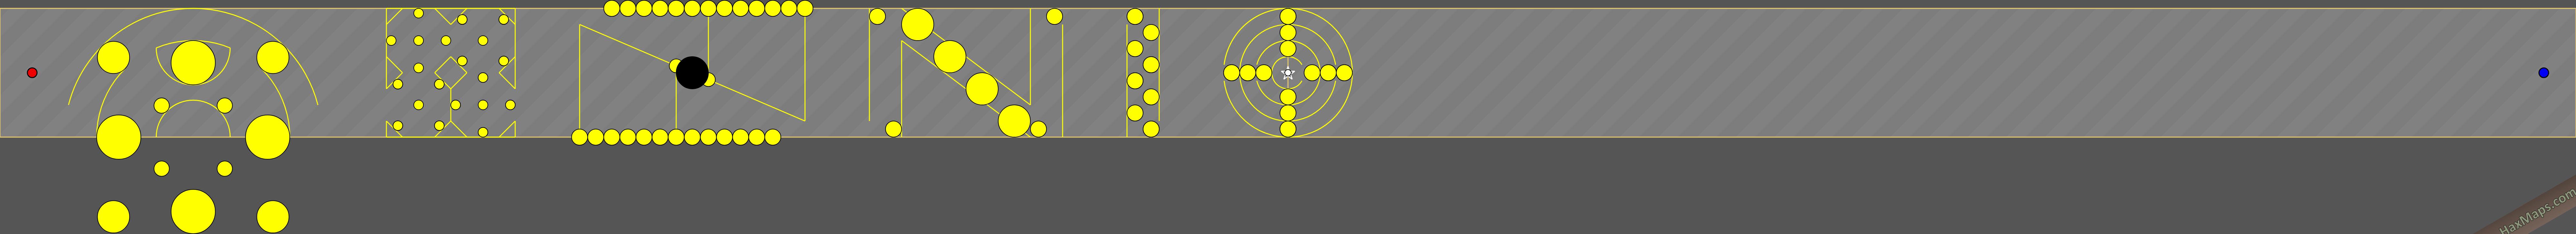 hax ball maps | Yellow-26